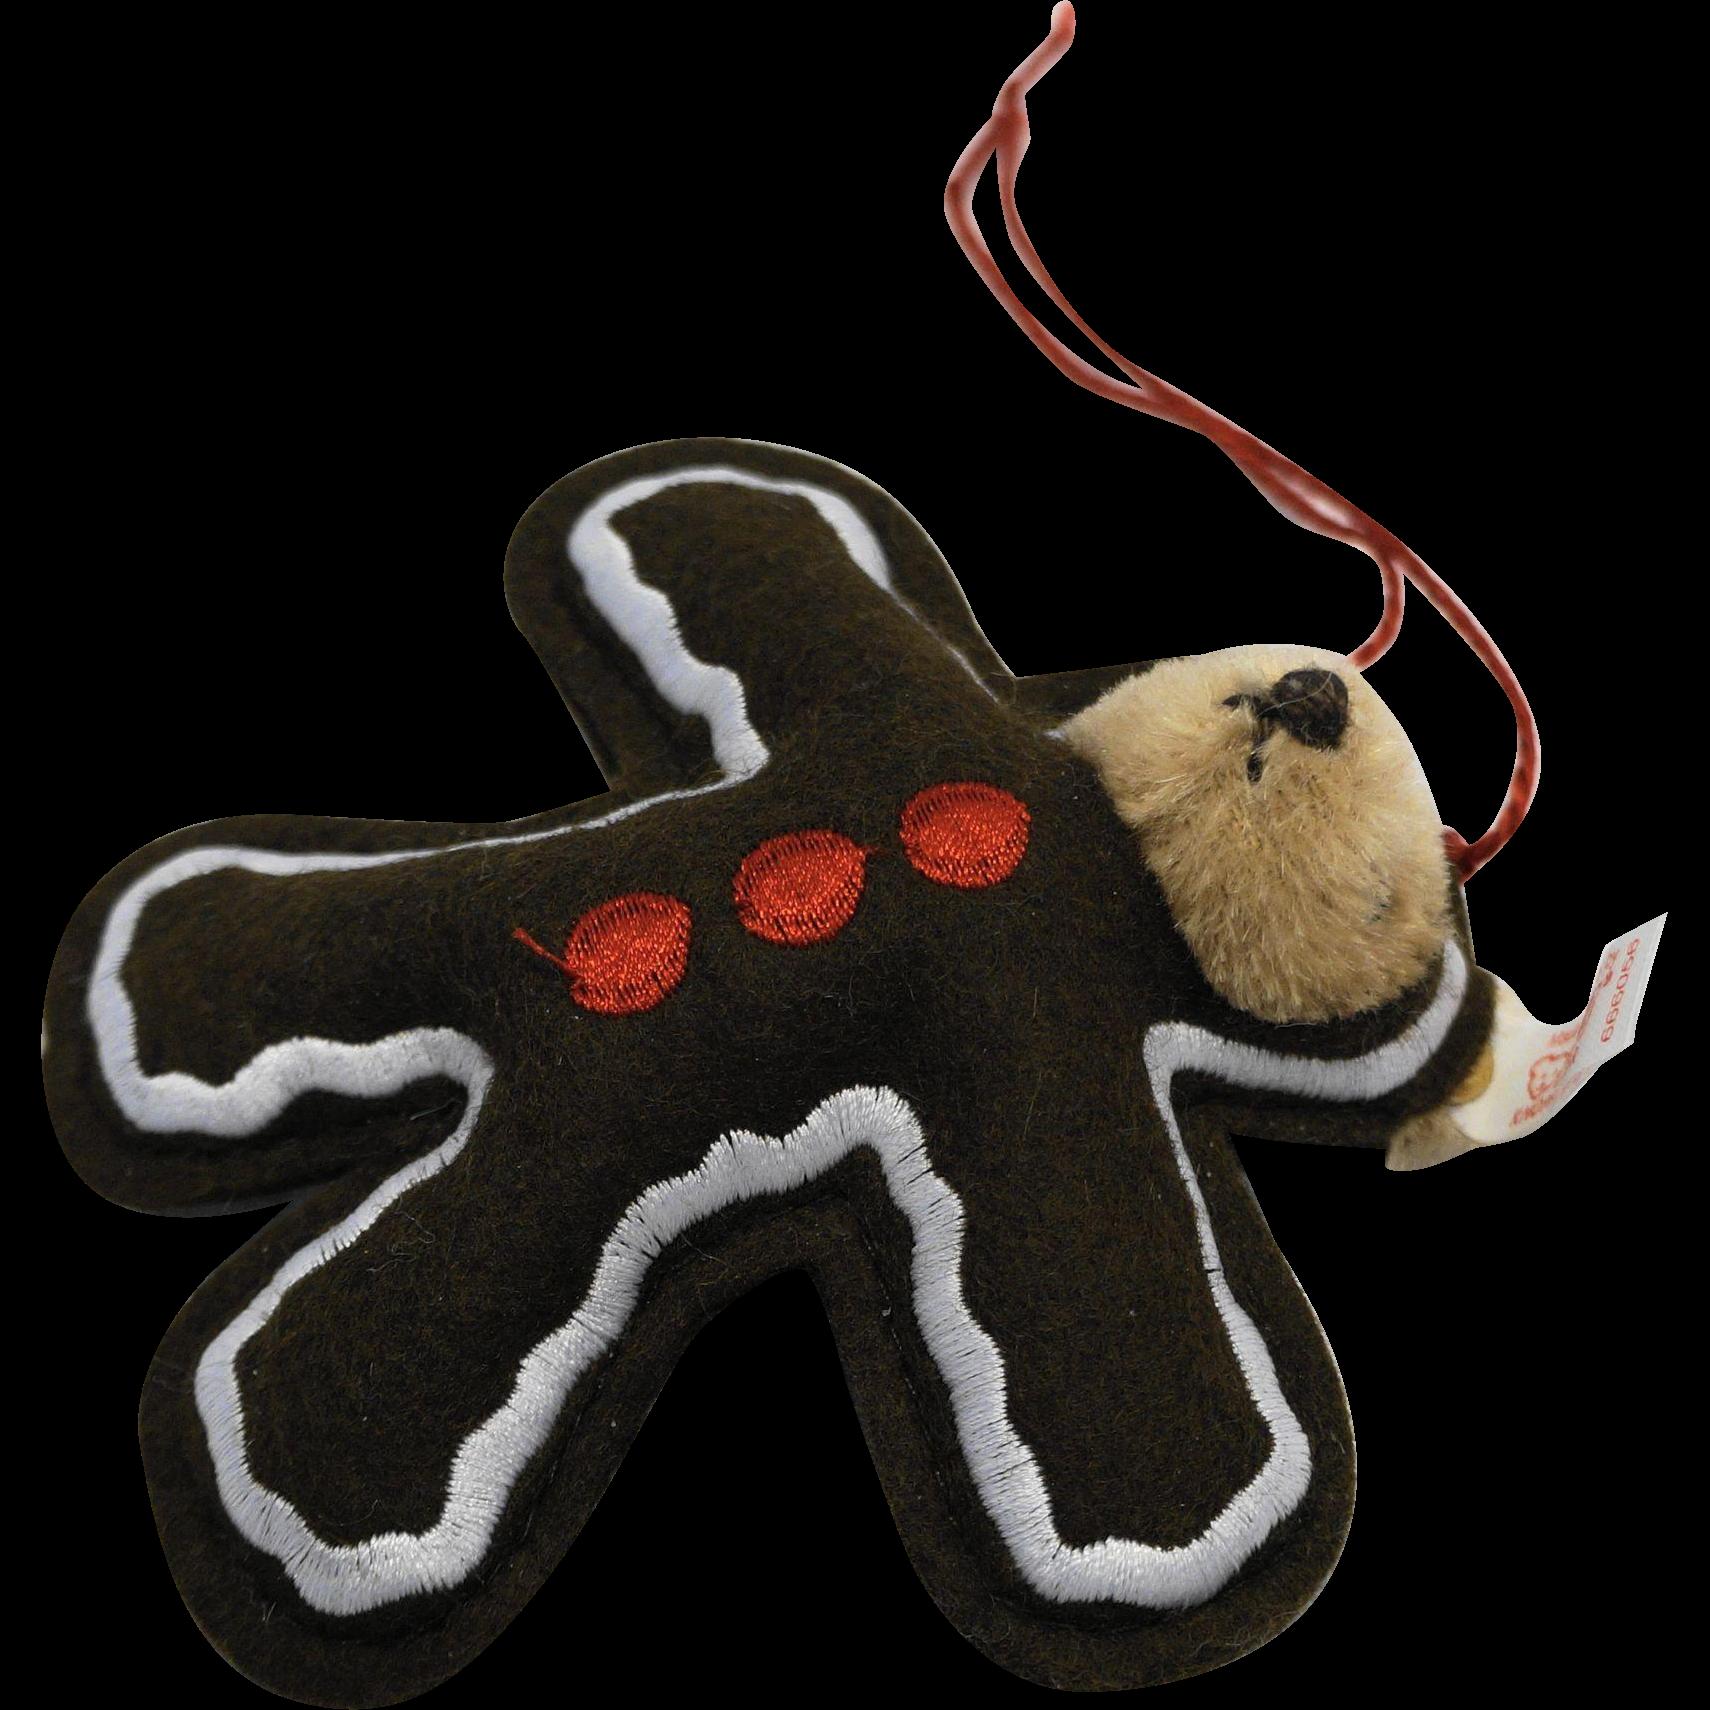 Steiff Gingerbread Man Teddy Christmas Ornament 666056 Ltd ...